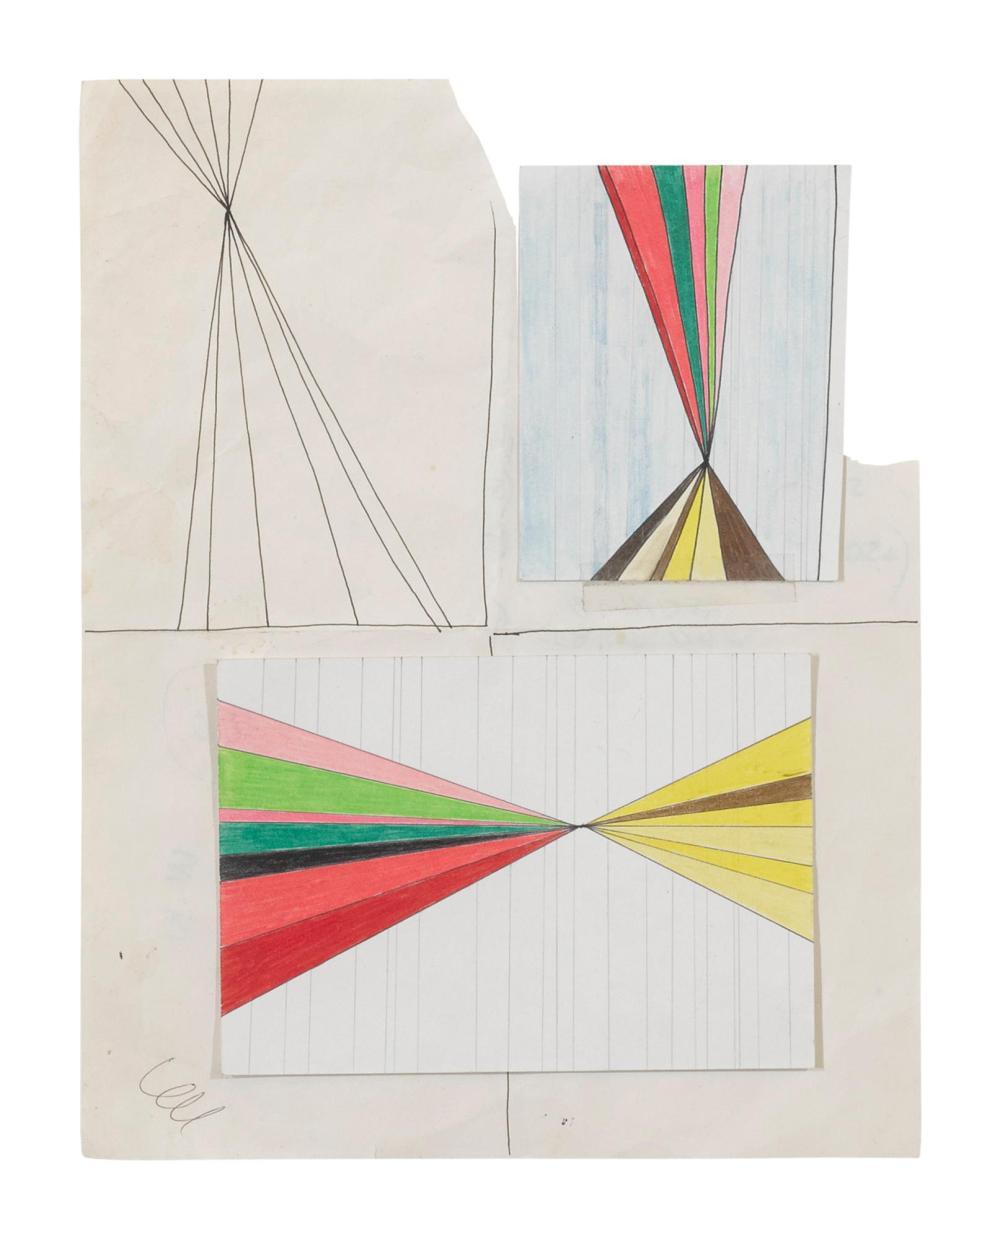 MARK GROTJAHN (B. 1968)   Untitled, 2001